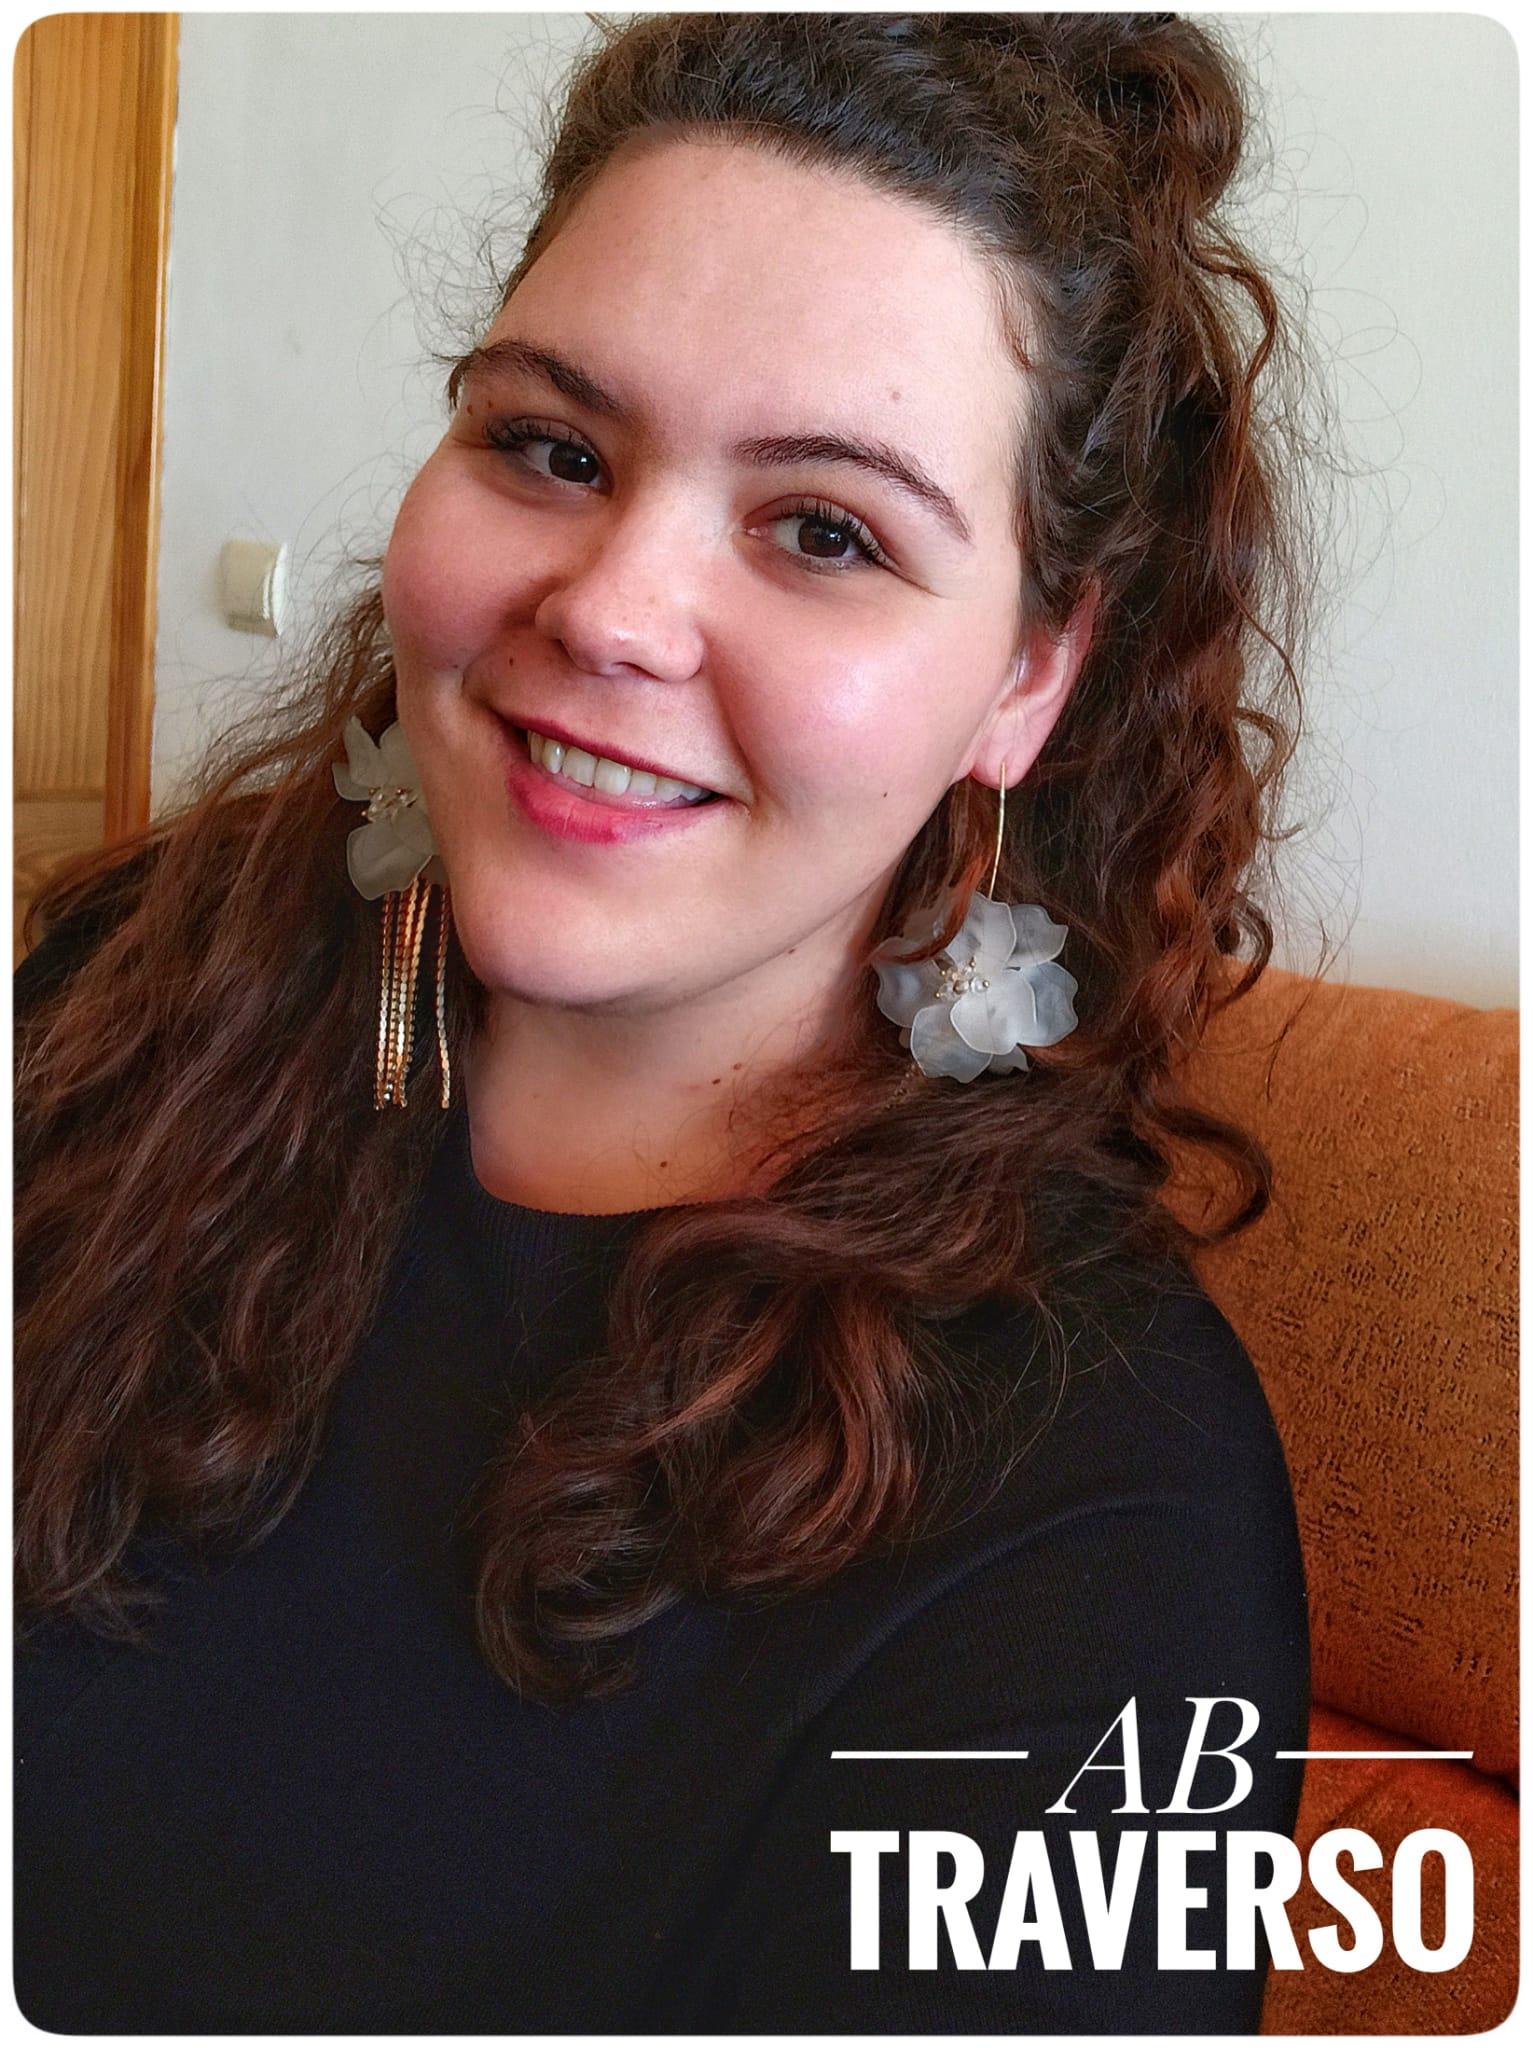 Ana Belén Traverso